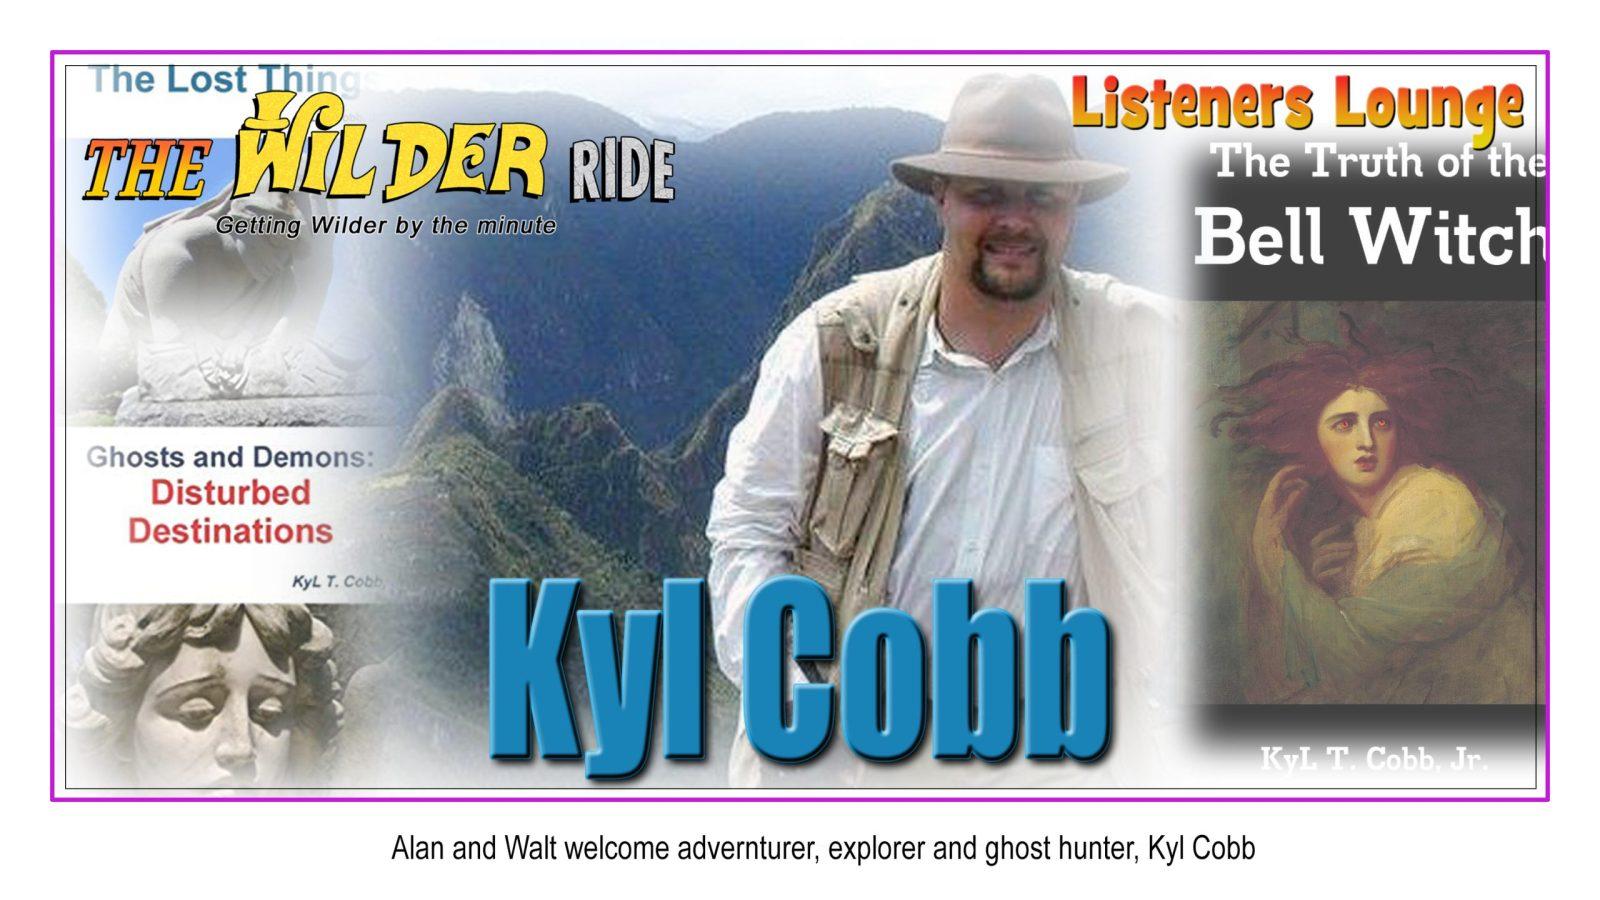 Kyl Cobb